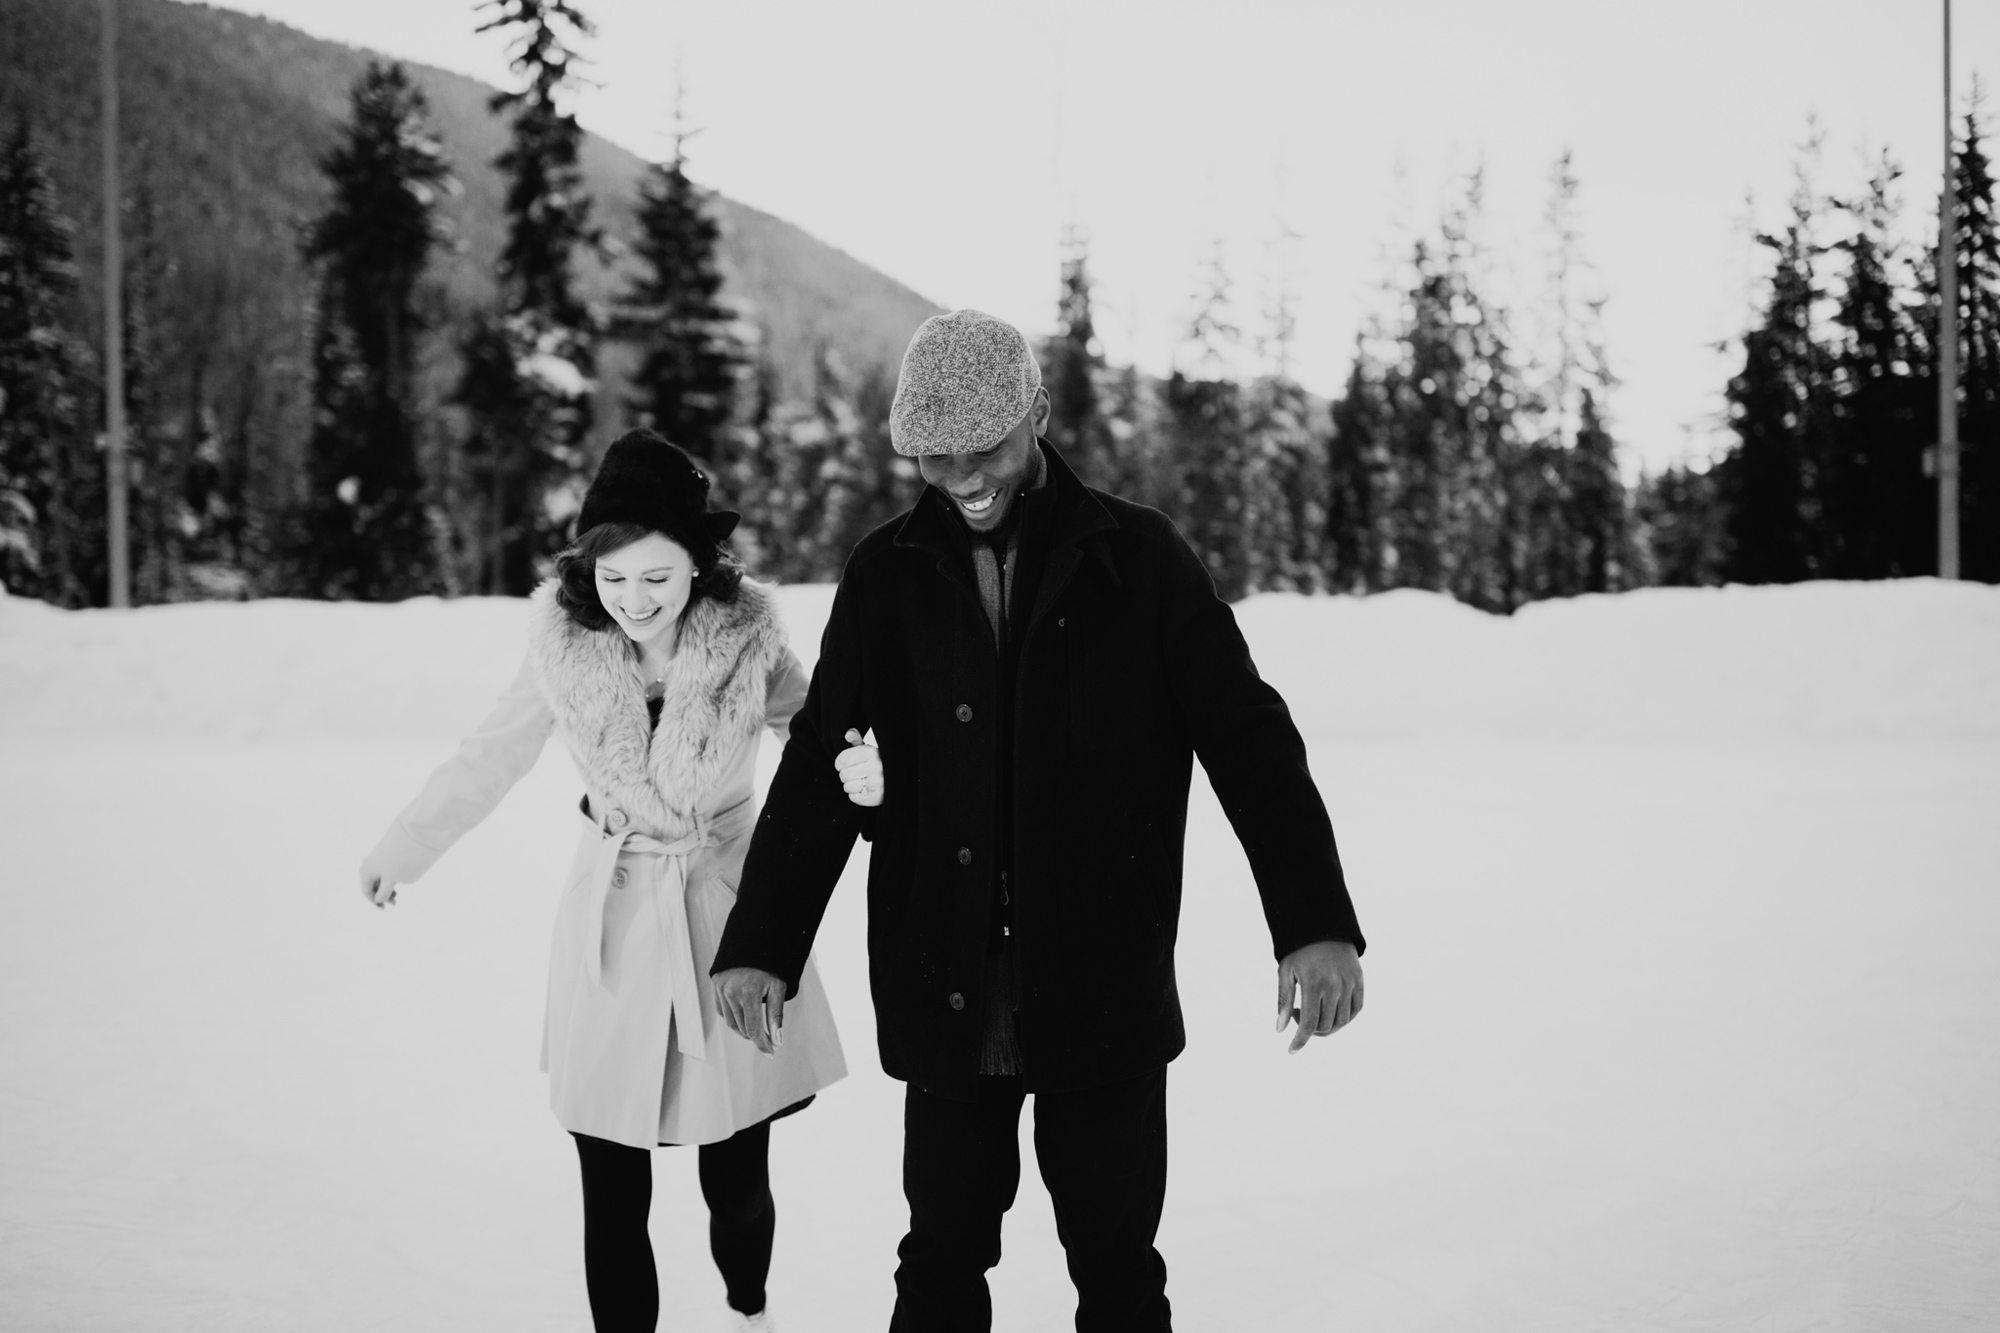 071-adventure-engagement-photographer